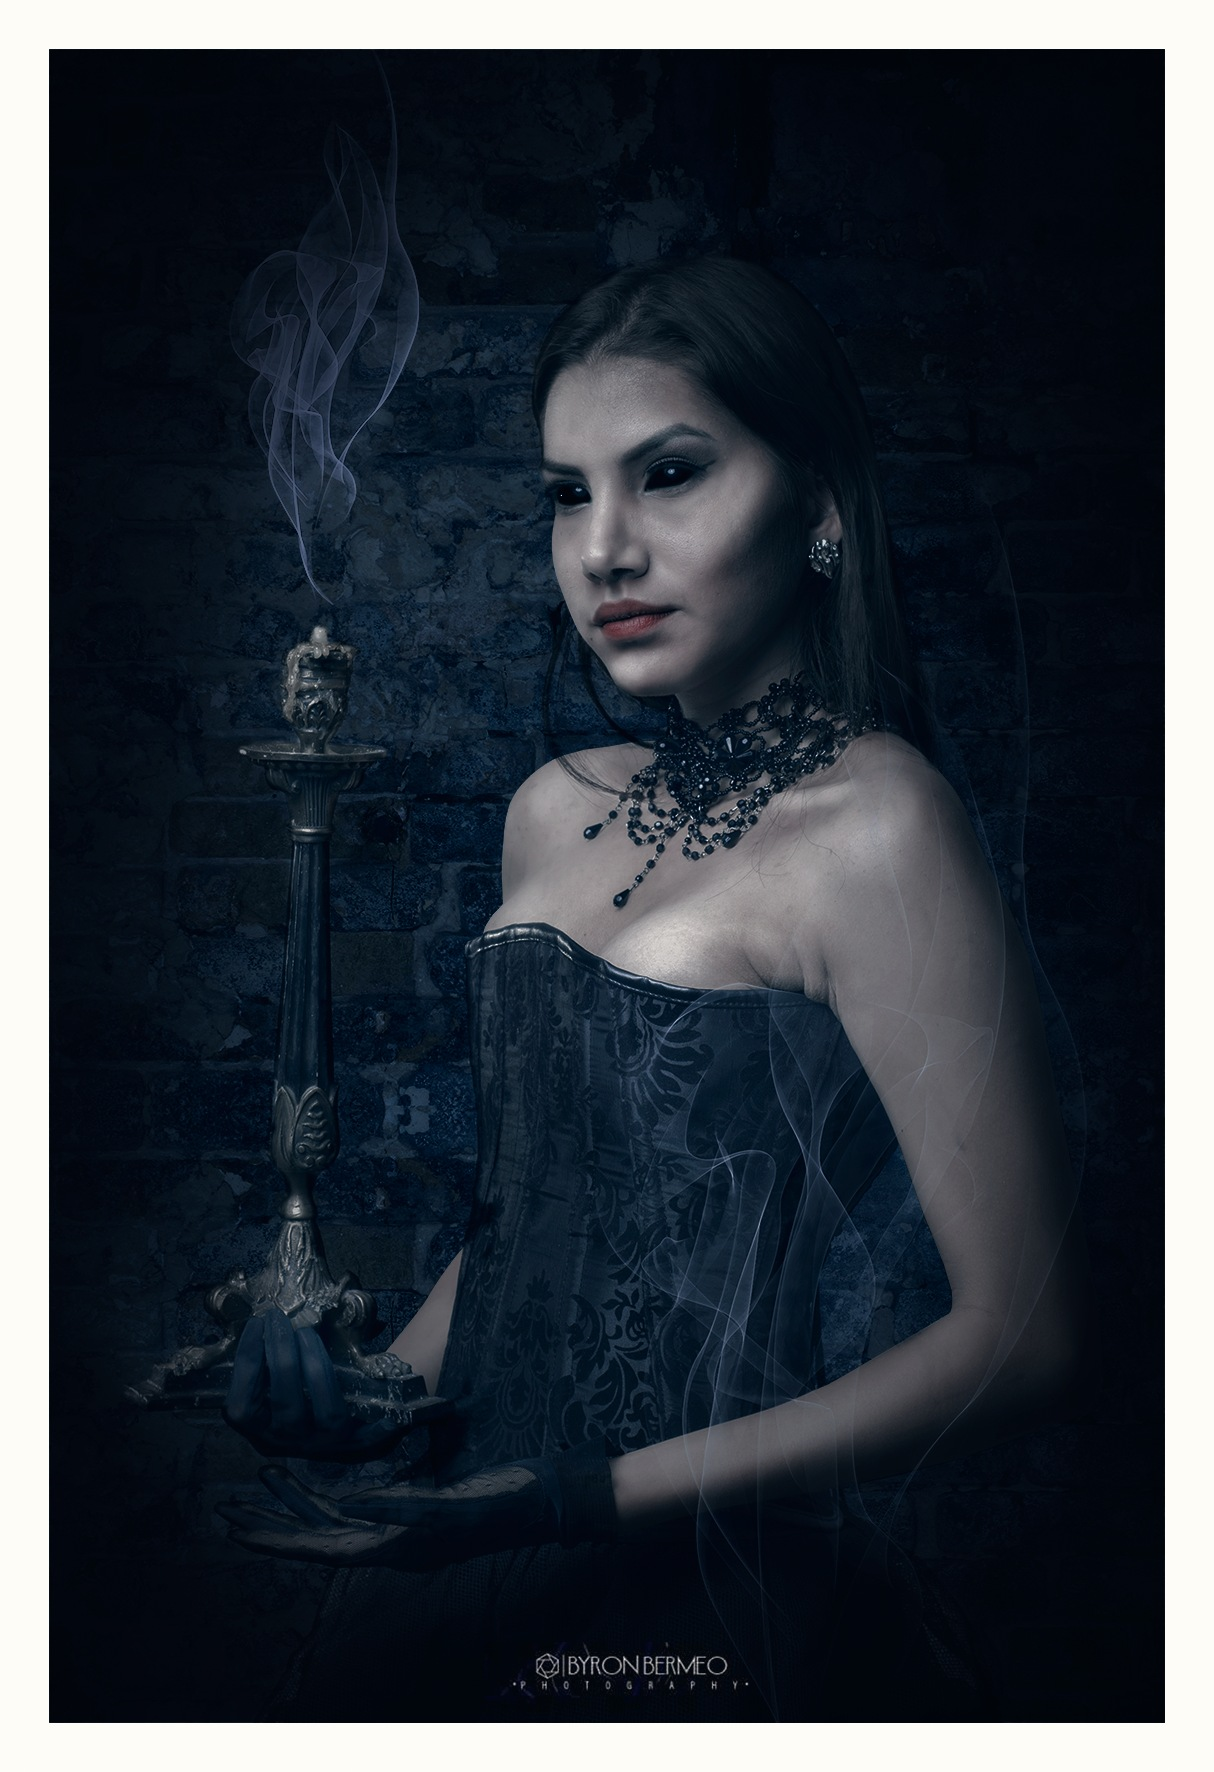 Dark Beauty by B Y R O N   B E R M E O  (MORT)